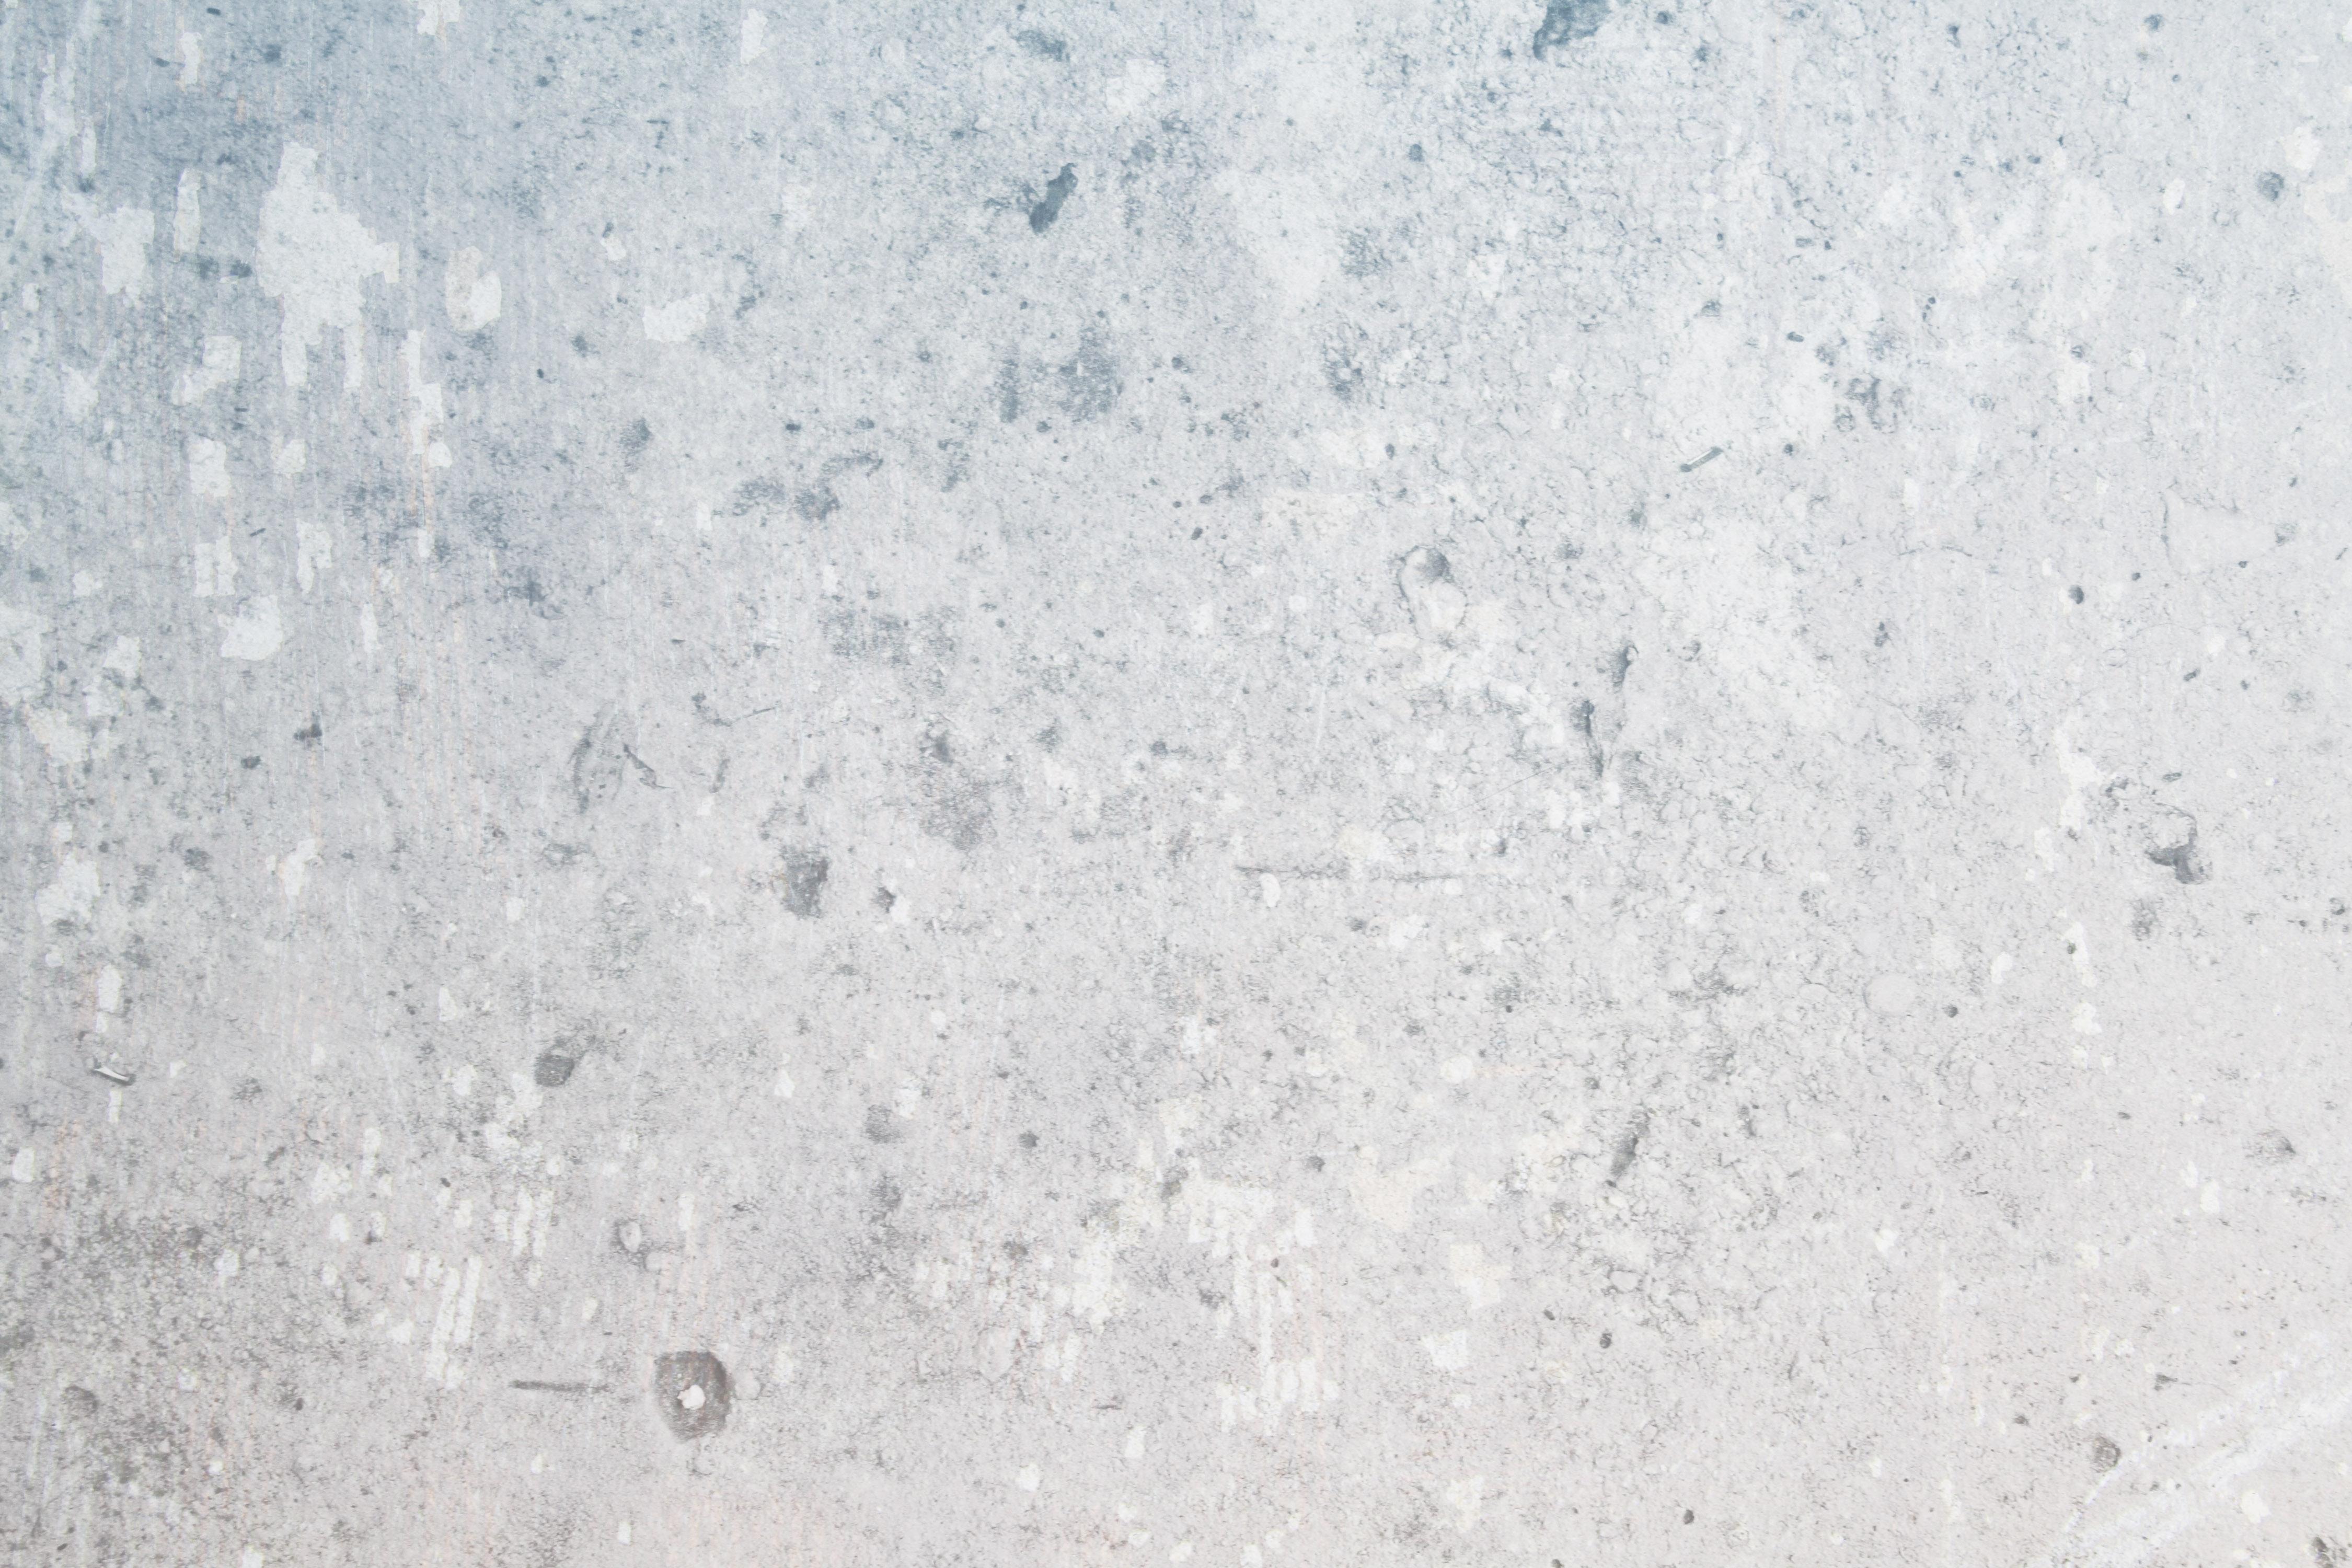 Free Subtle Grey Grunge Textures Texture L T